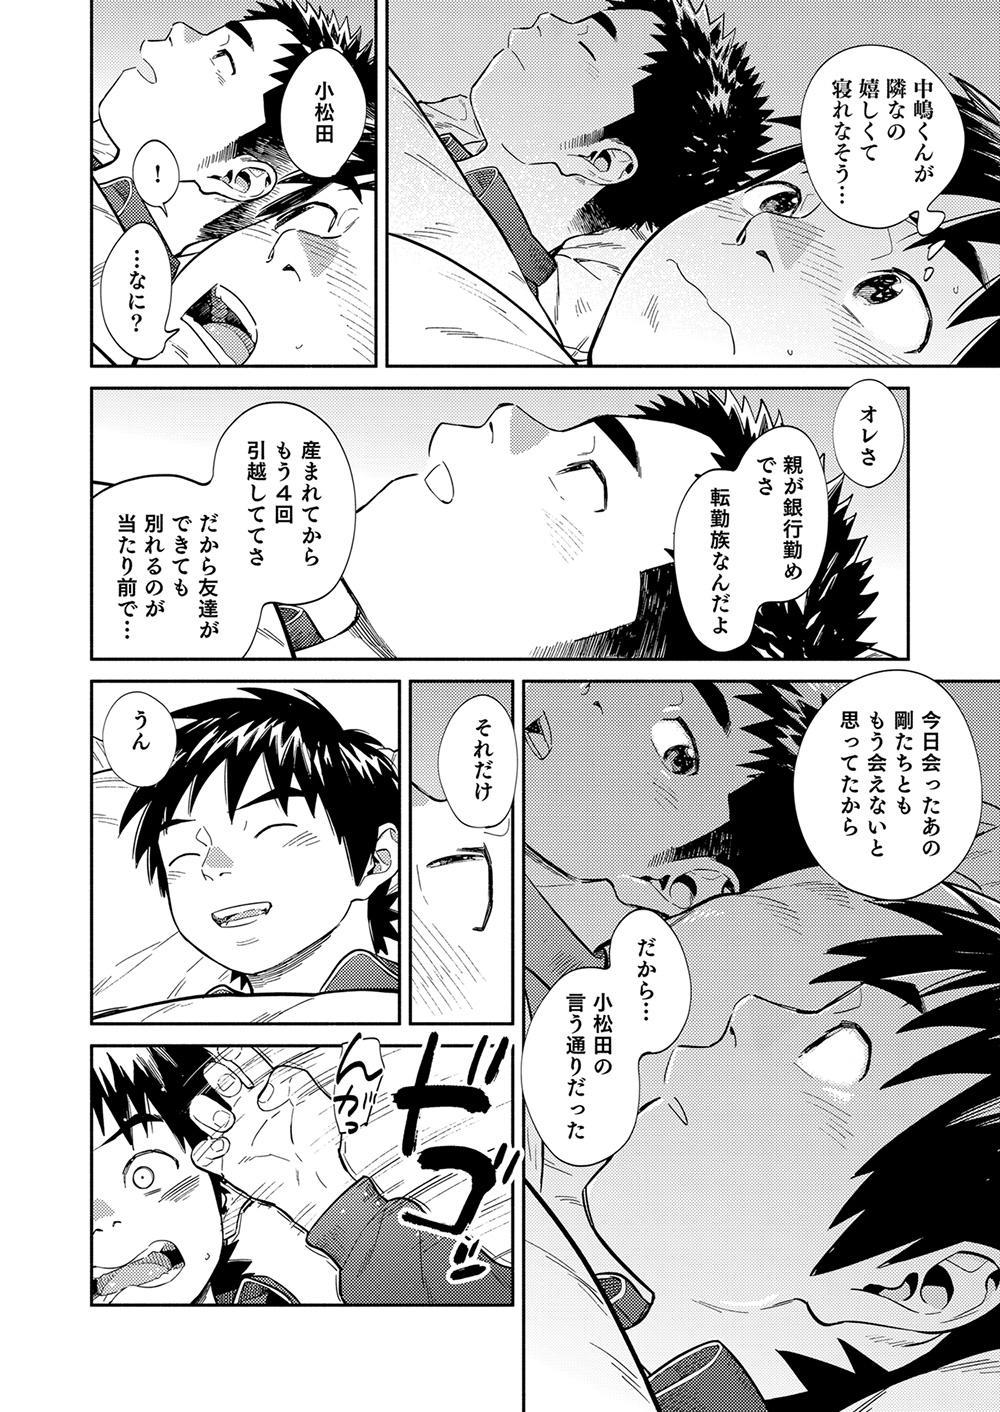 Manga Shounen Zoom Vol. 34 27